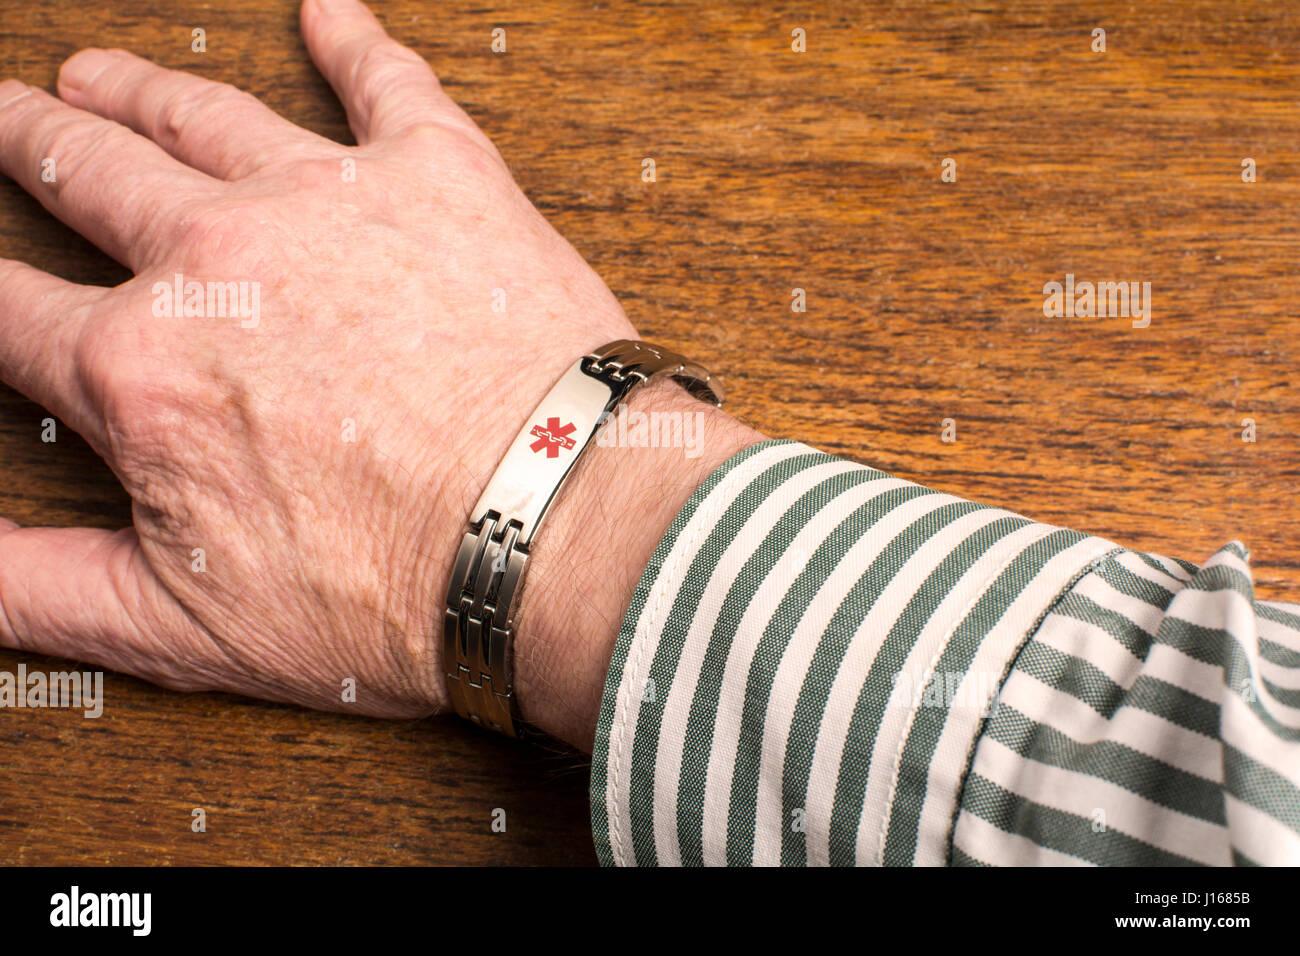 A medical alert wristband on a man's wrist - Stock Image